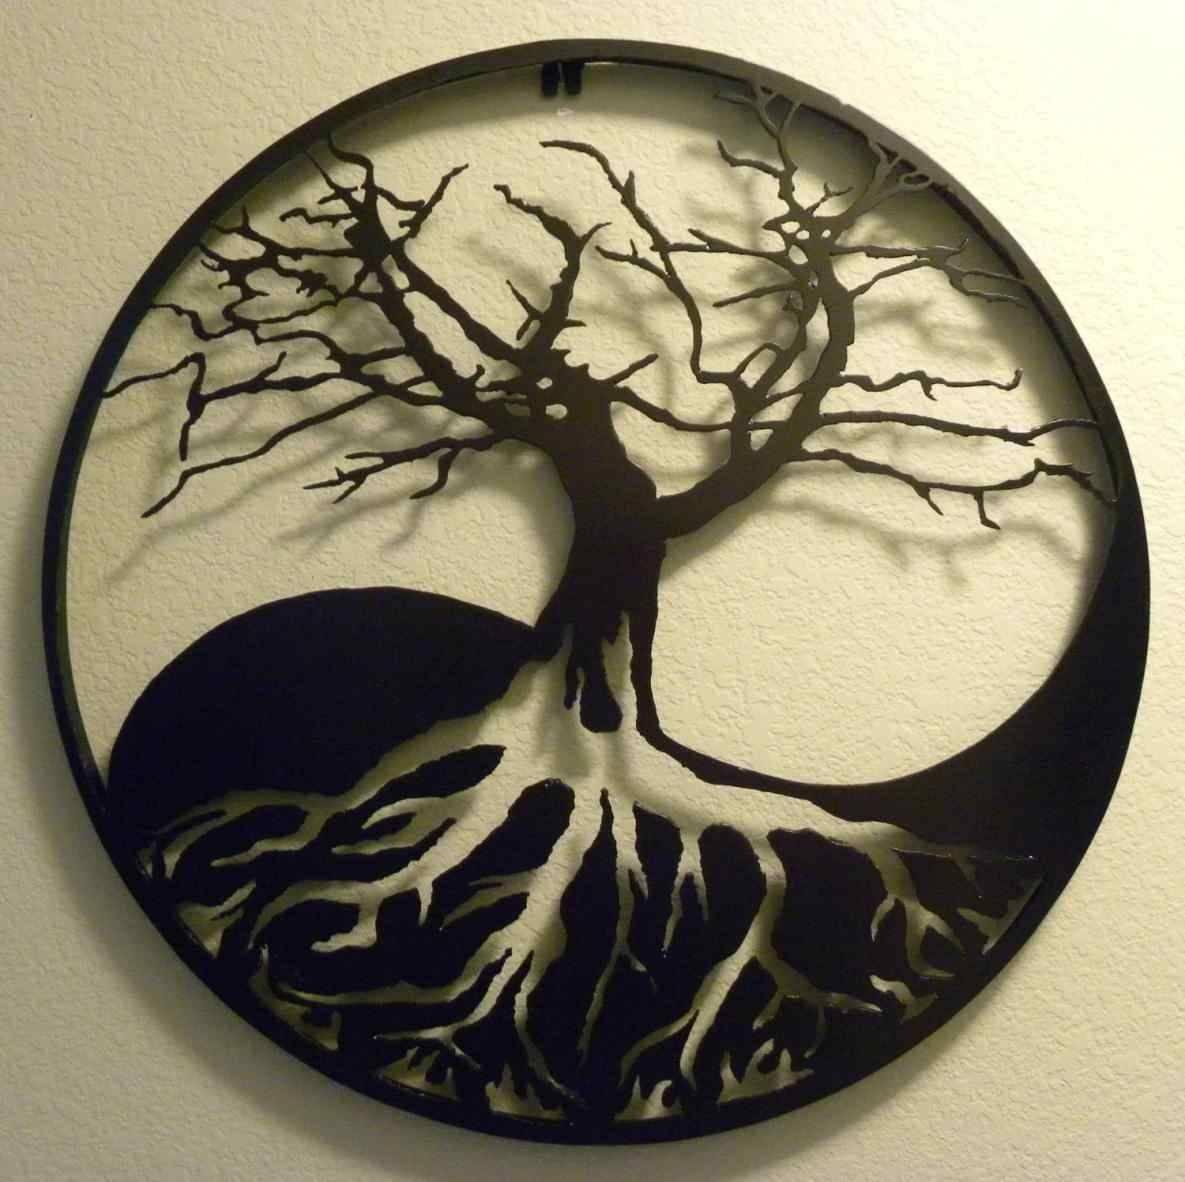 Metal Oak Tree Wall Art | Home Interior Decor Throughout Newest Oak Tree Wall Art (View 29 of 30)